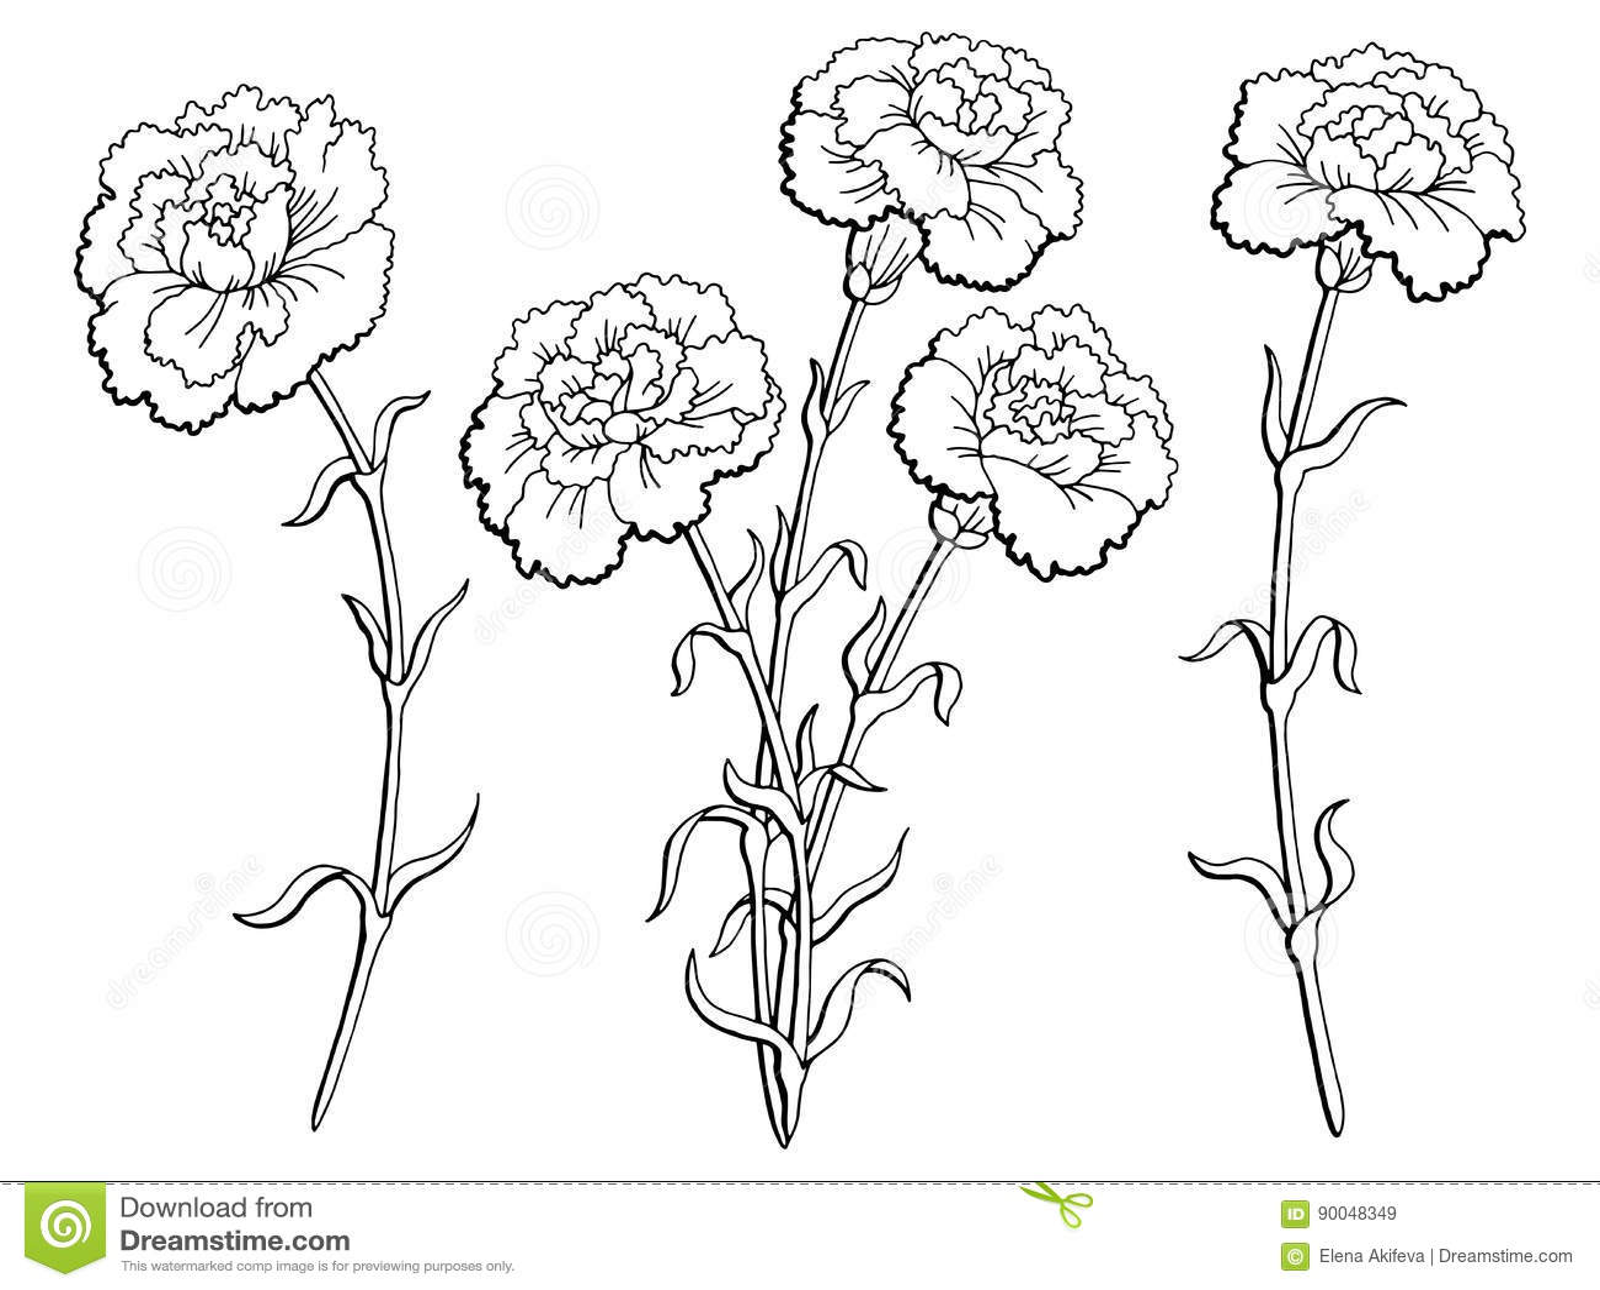 Carnation Flower Line Drawing : Carnation cartoons illustrations vector stock images